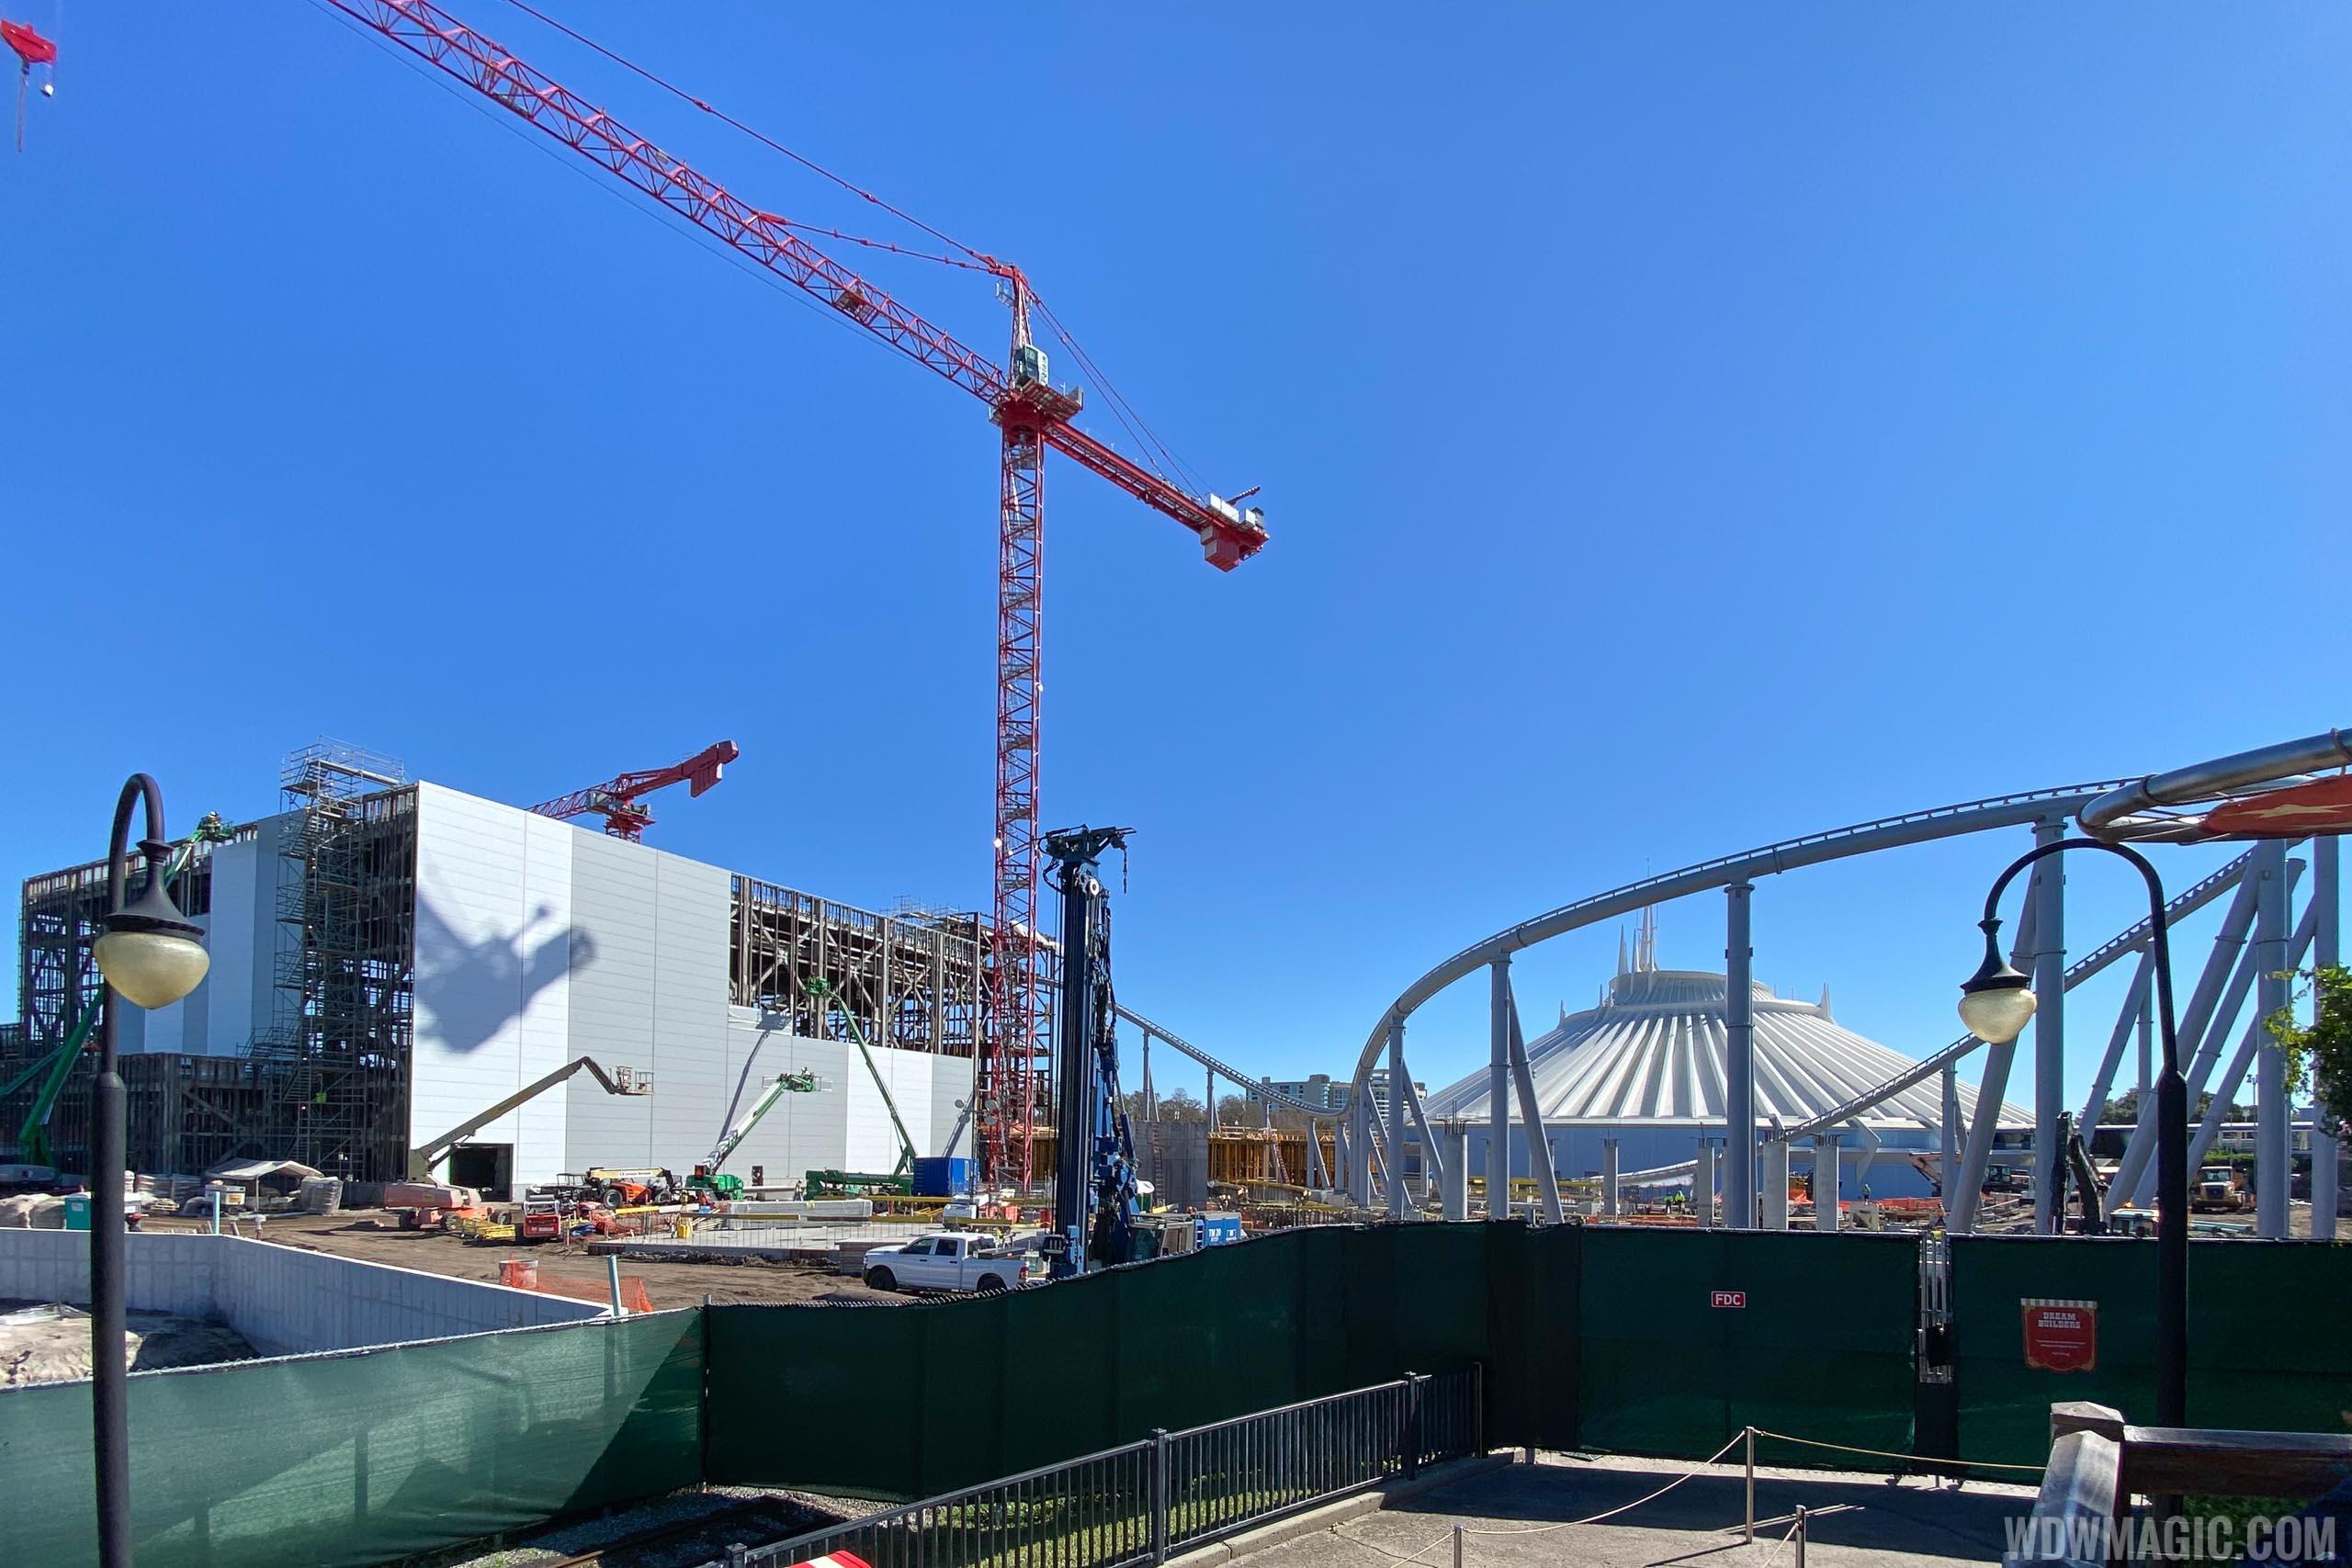 PHOTOS - Tron Lightcycle Run coaster construction at Magic Kingdom